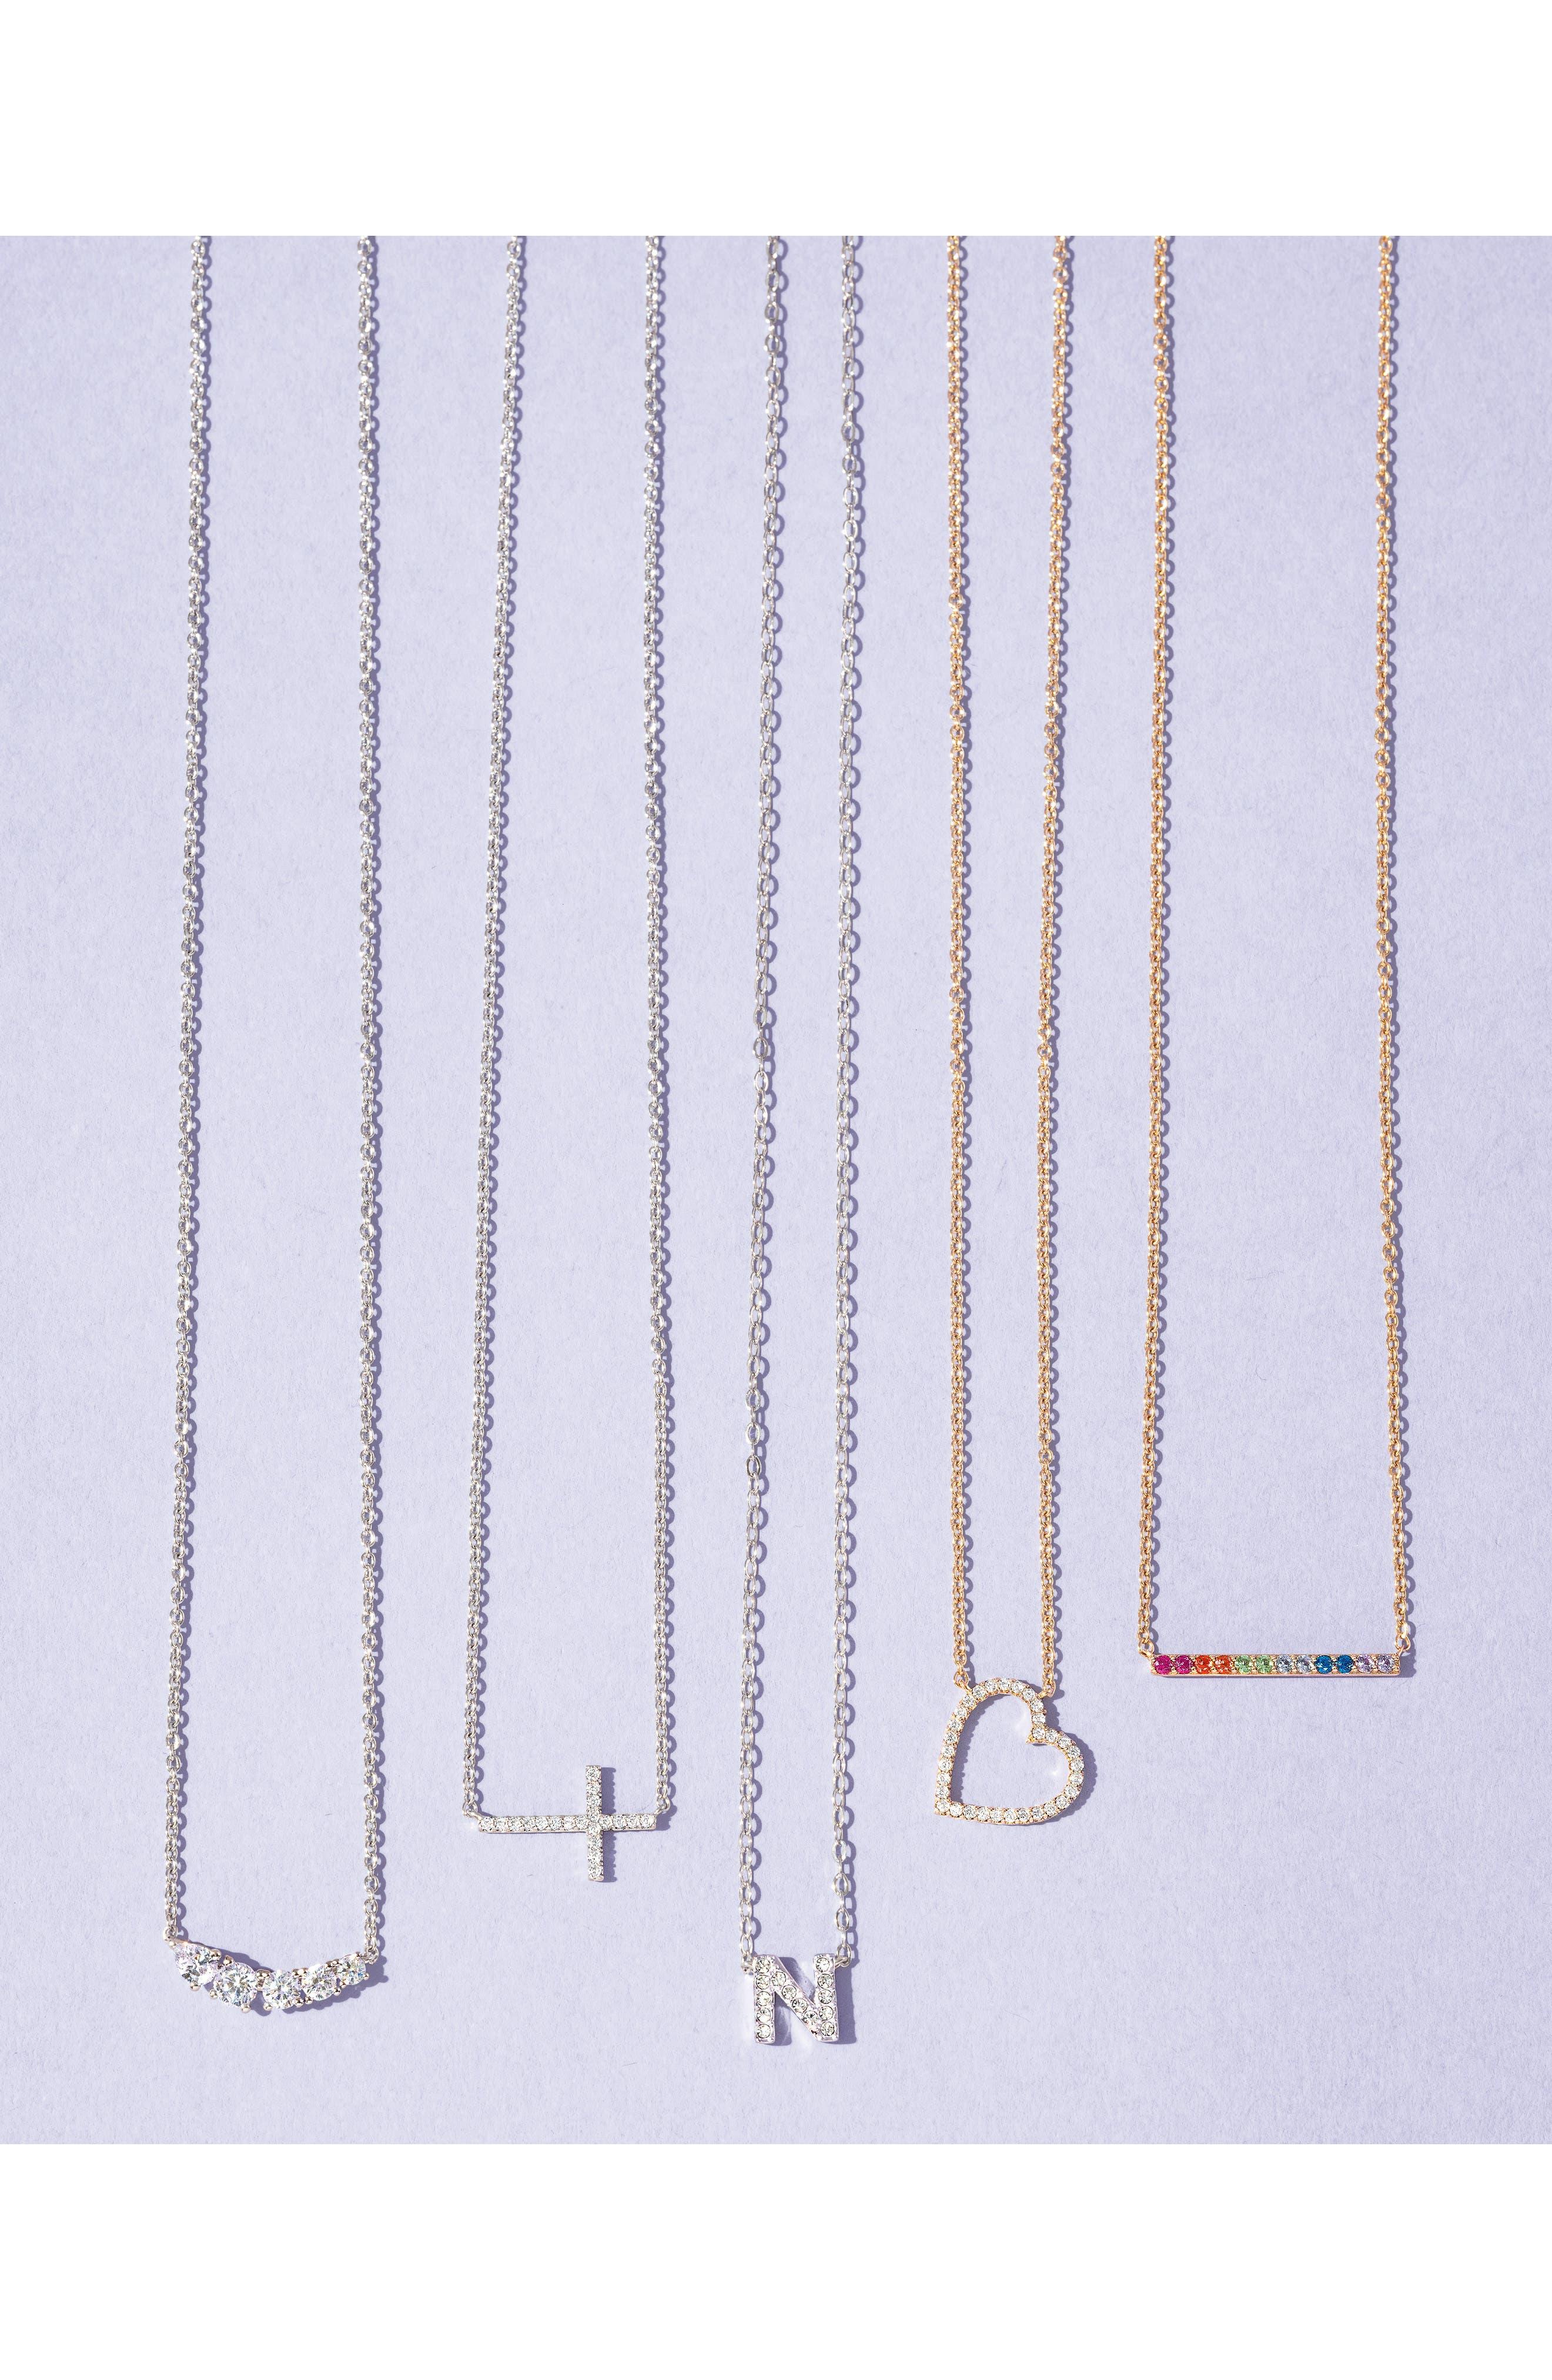 NADRI, Initial Pendant Necklace, Alternate thumbnail 3, color, N SILVER